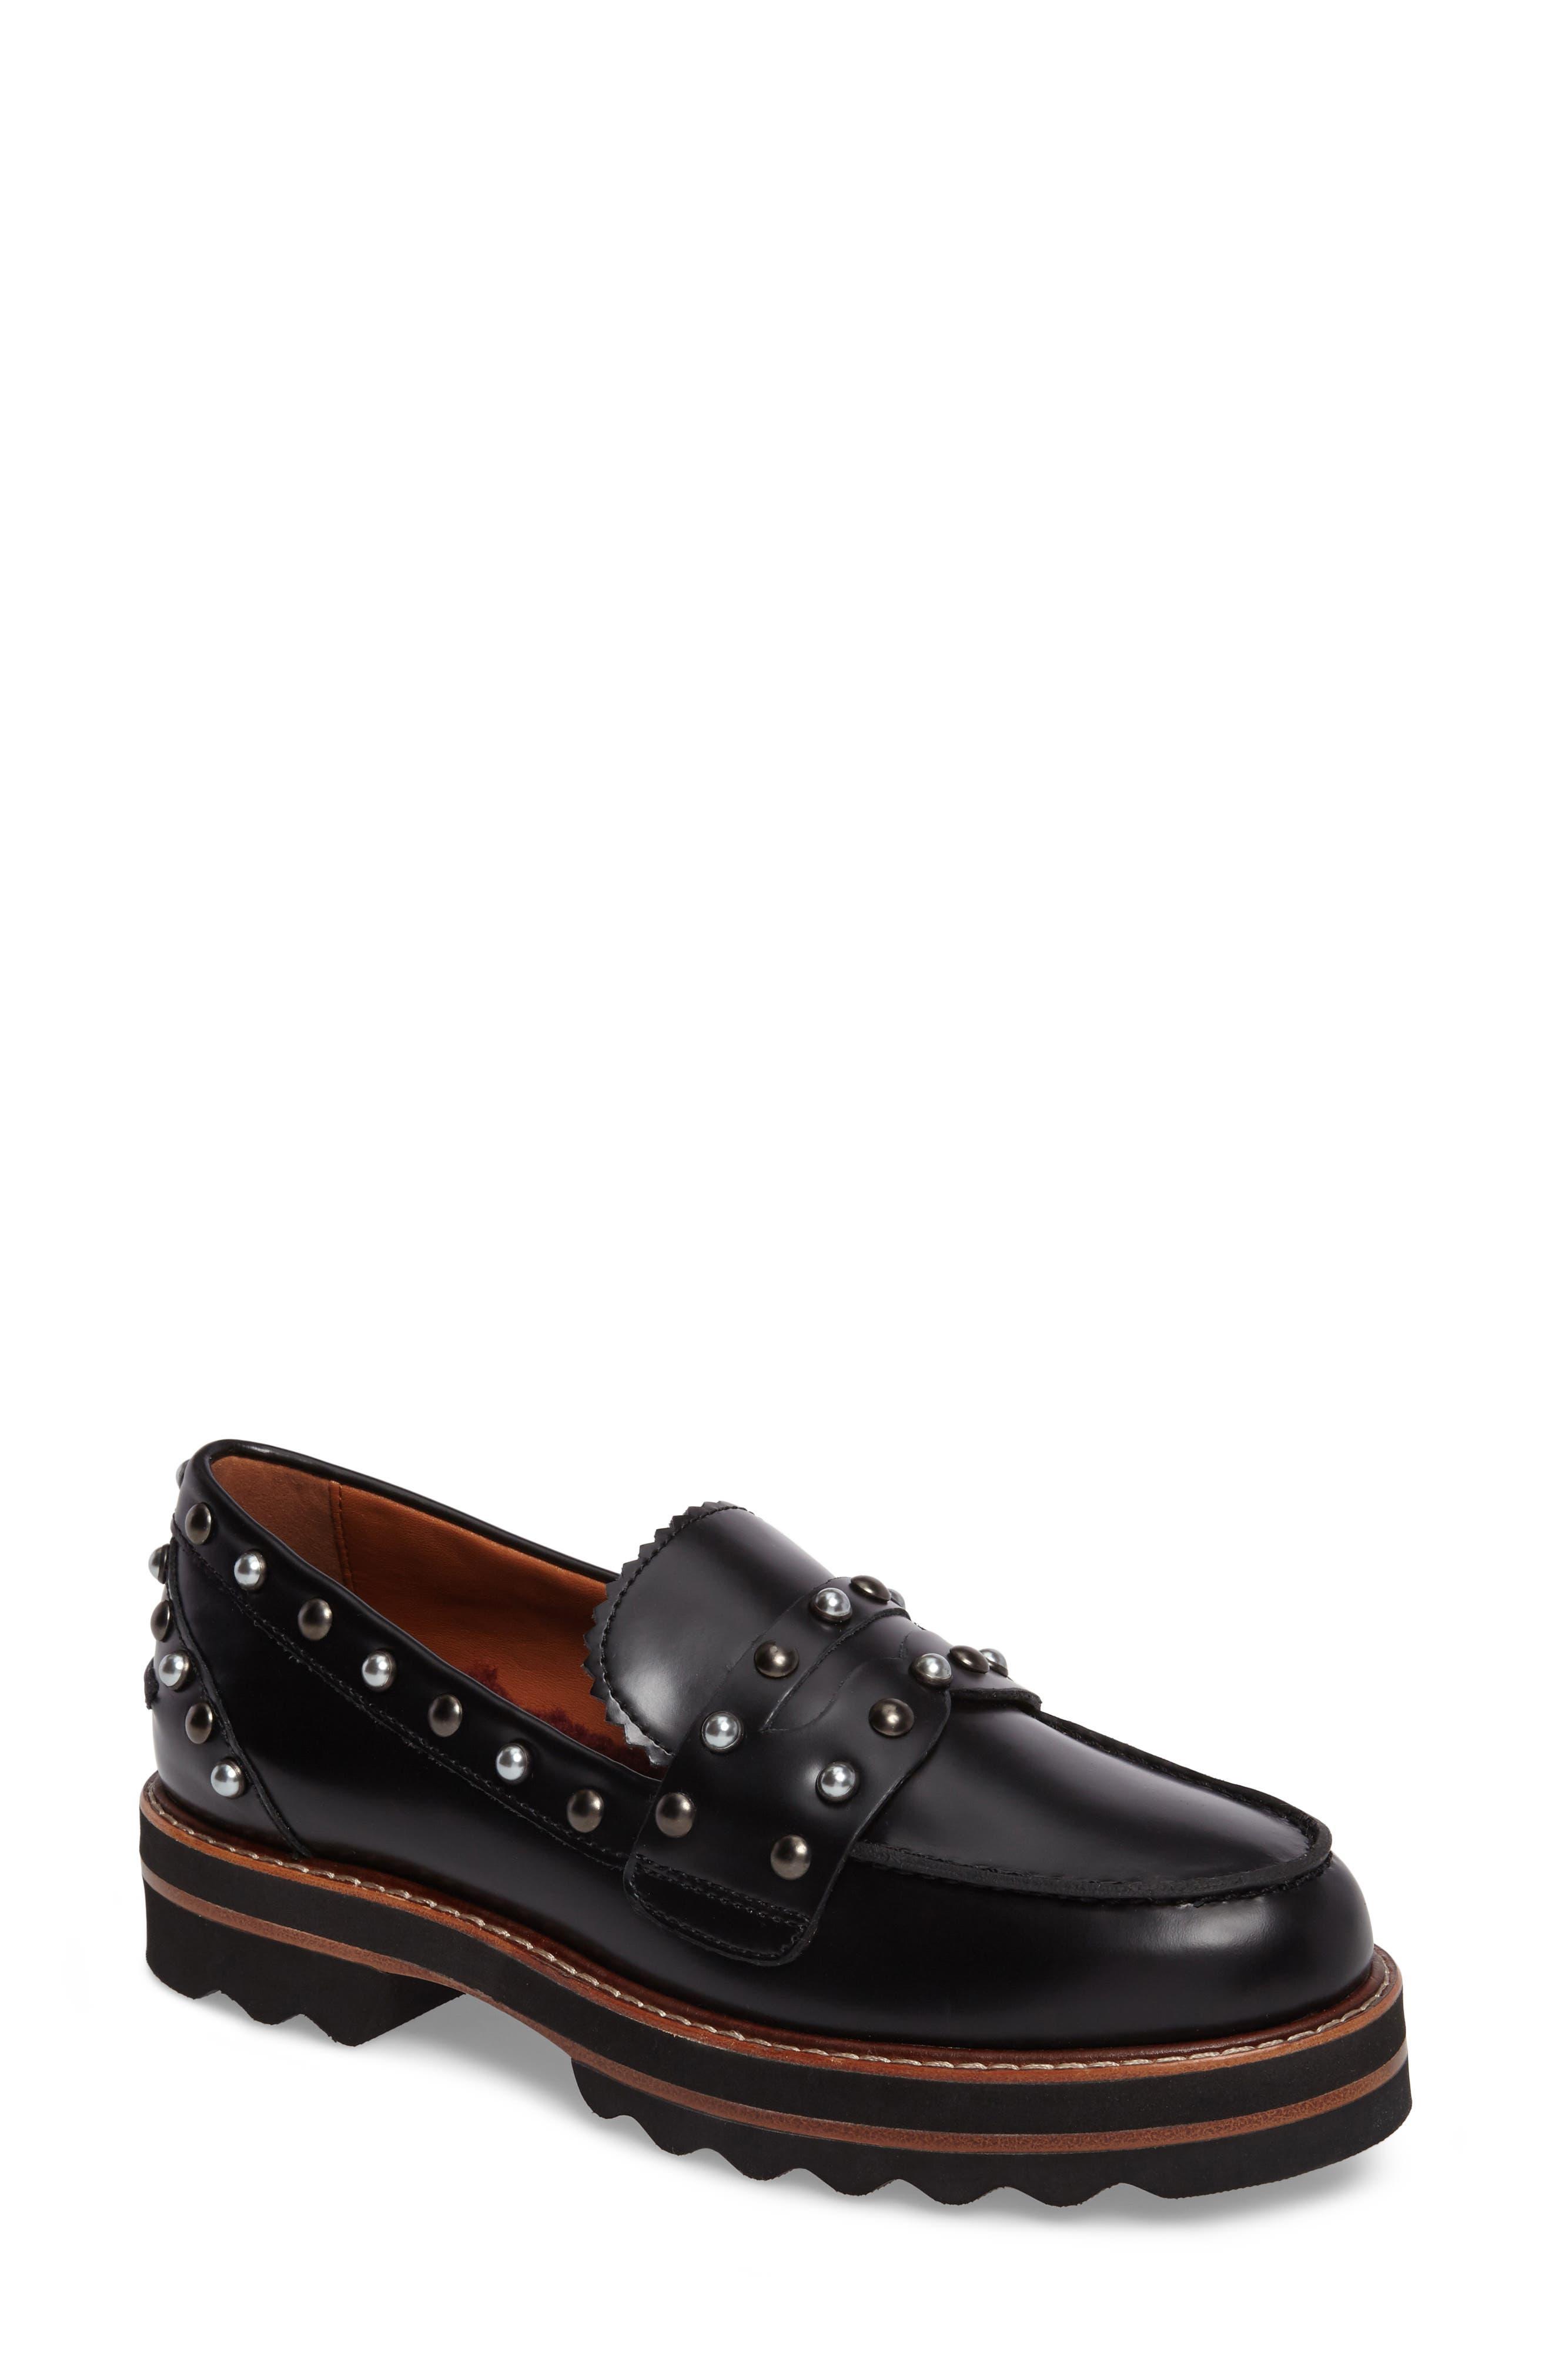 Lenox Loafer,                             Main thumbnail 1, color,                             Black Leather